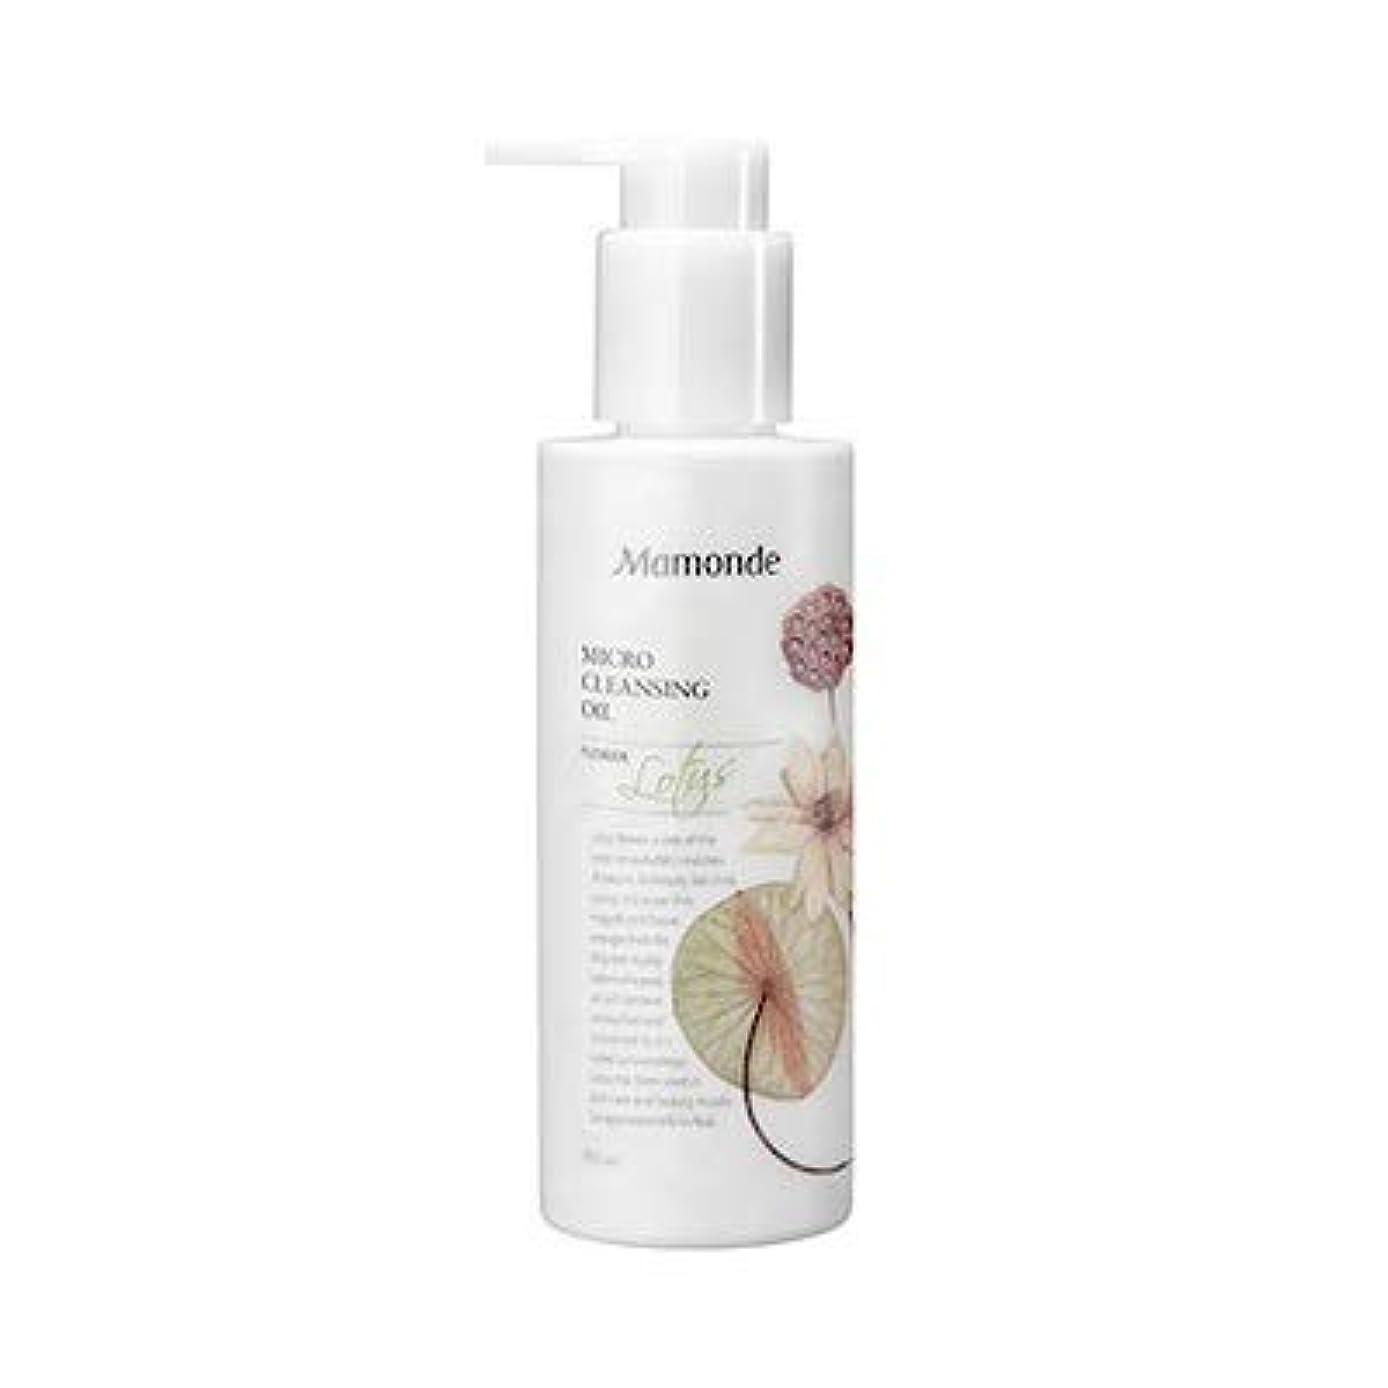 Mamonde Micro Cleansing Oil マモンド マイクロクレンジングオイル 200ml [並行輸入品]